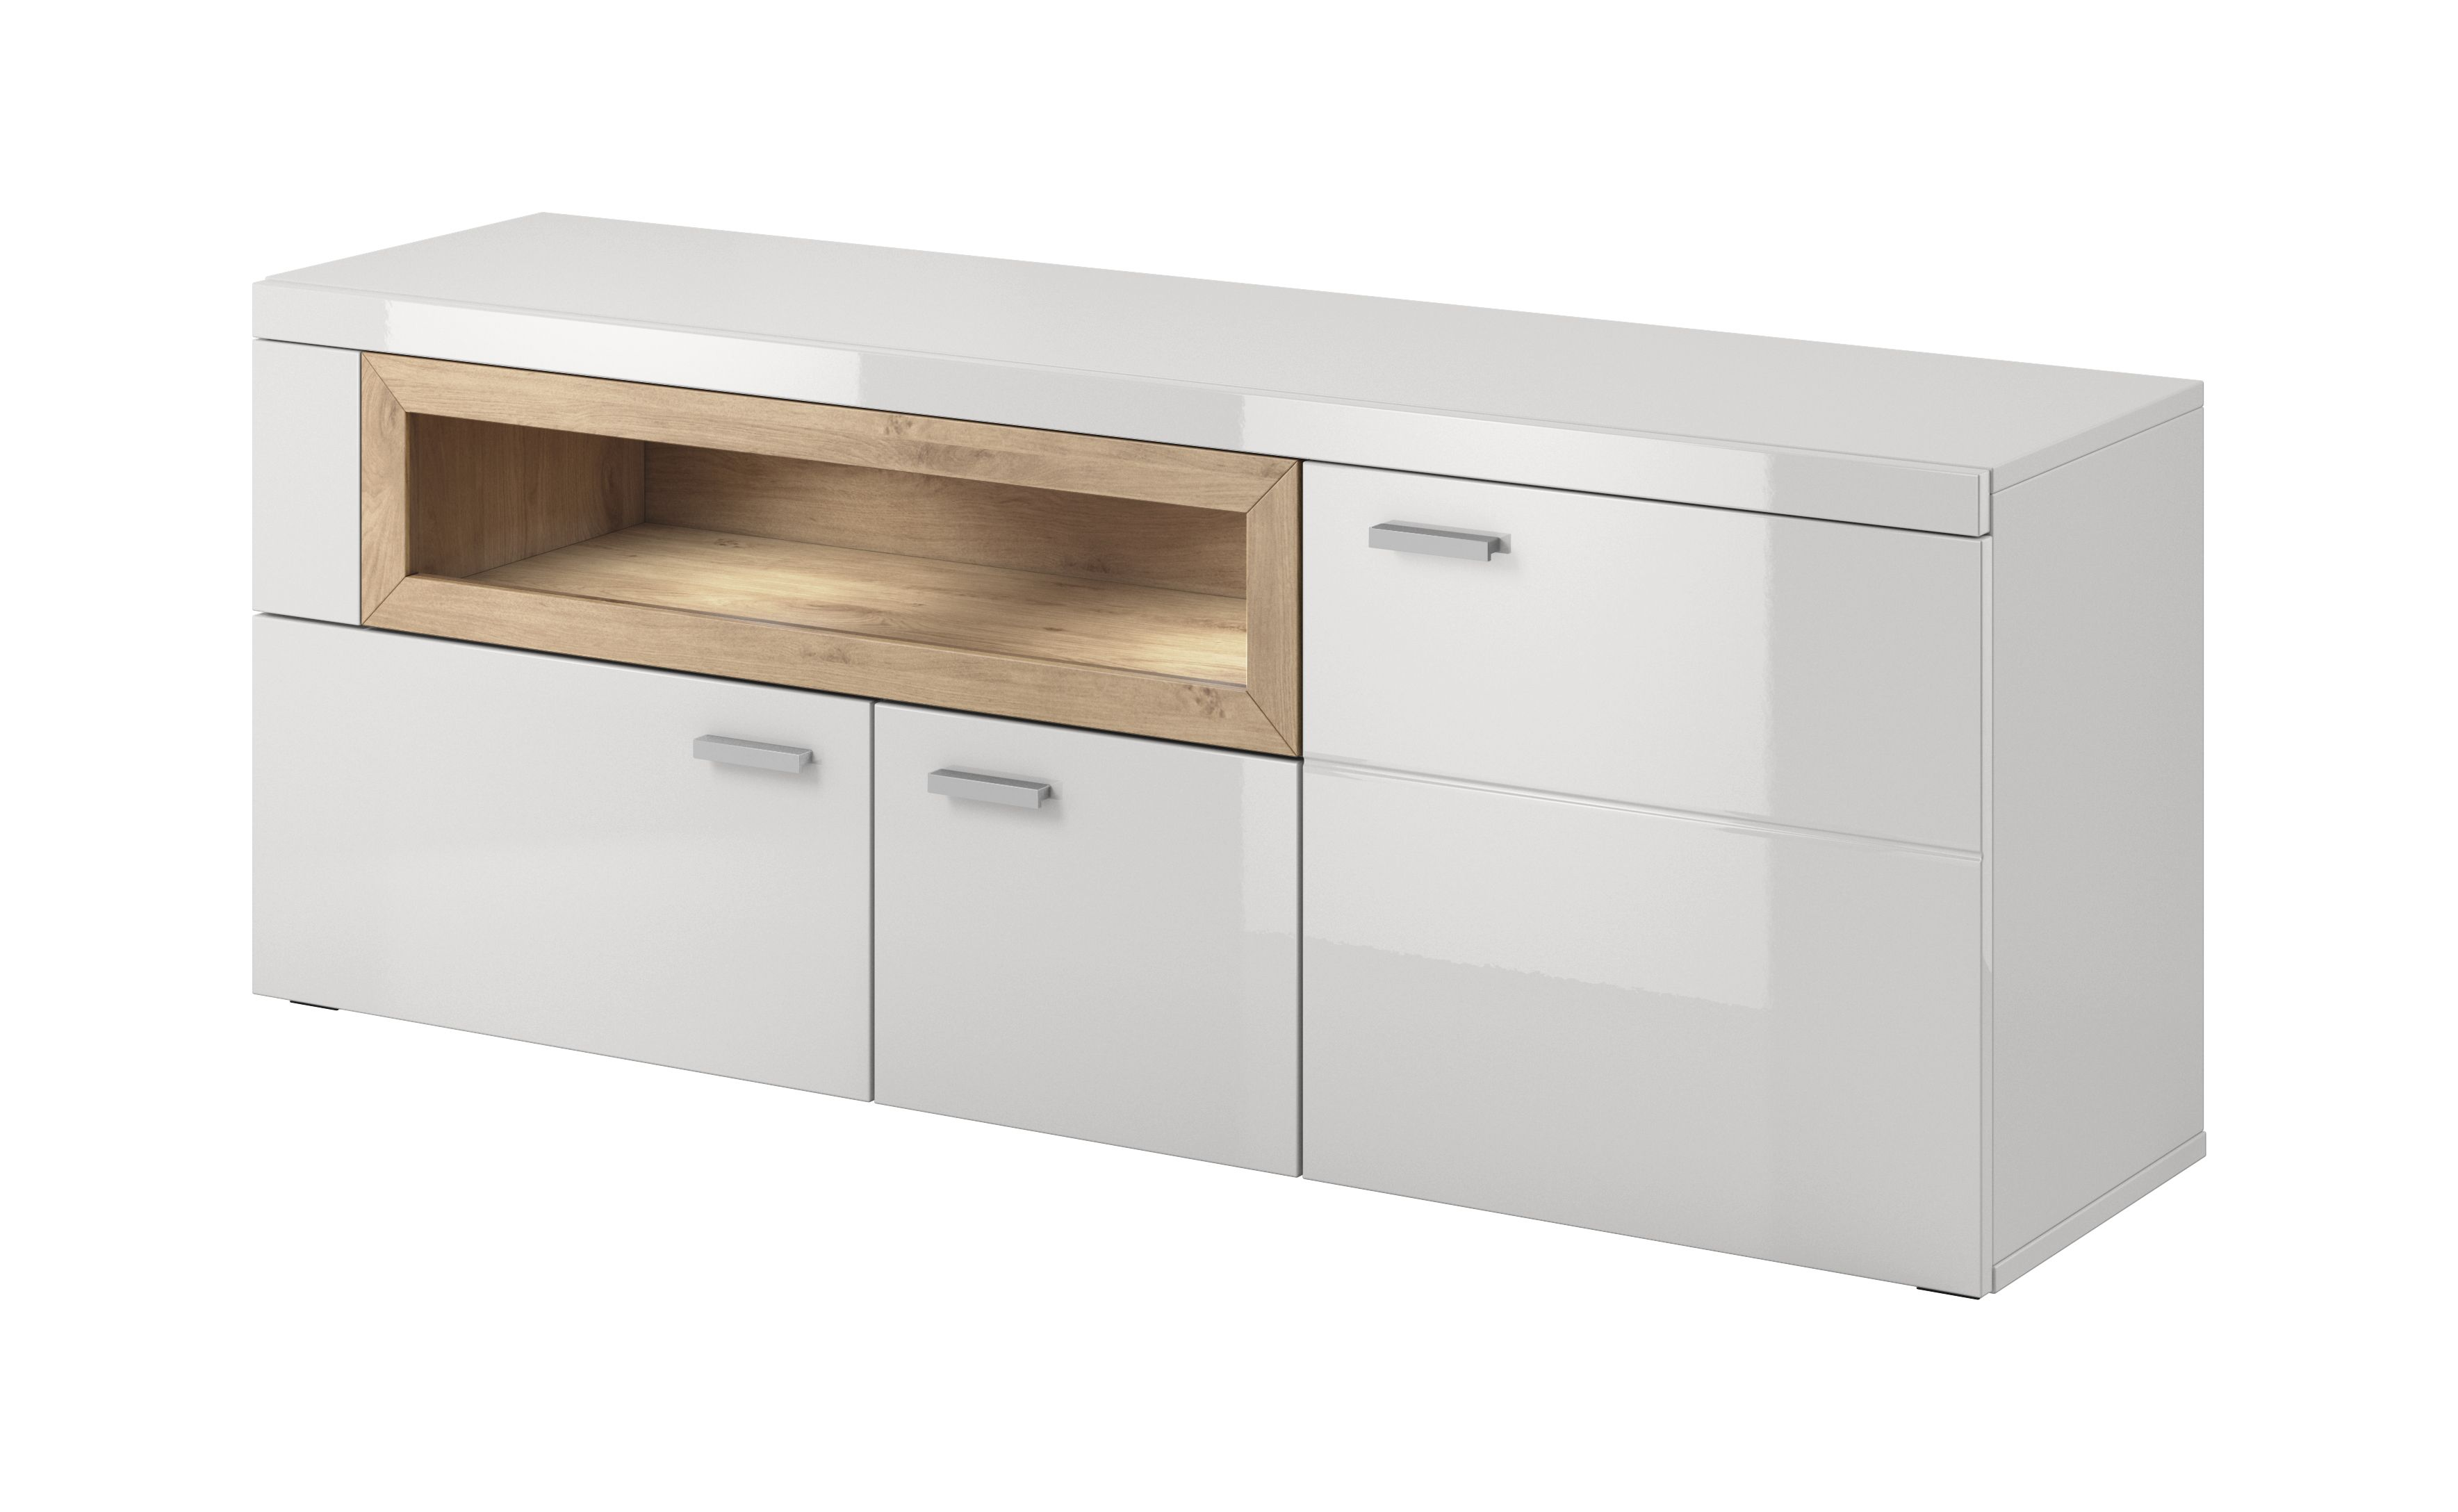 Tv Kast Zwevend : Box typ41 tv meubels pinterest tv cabinets tv unit en tv